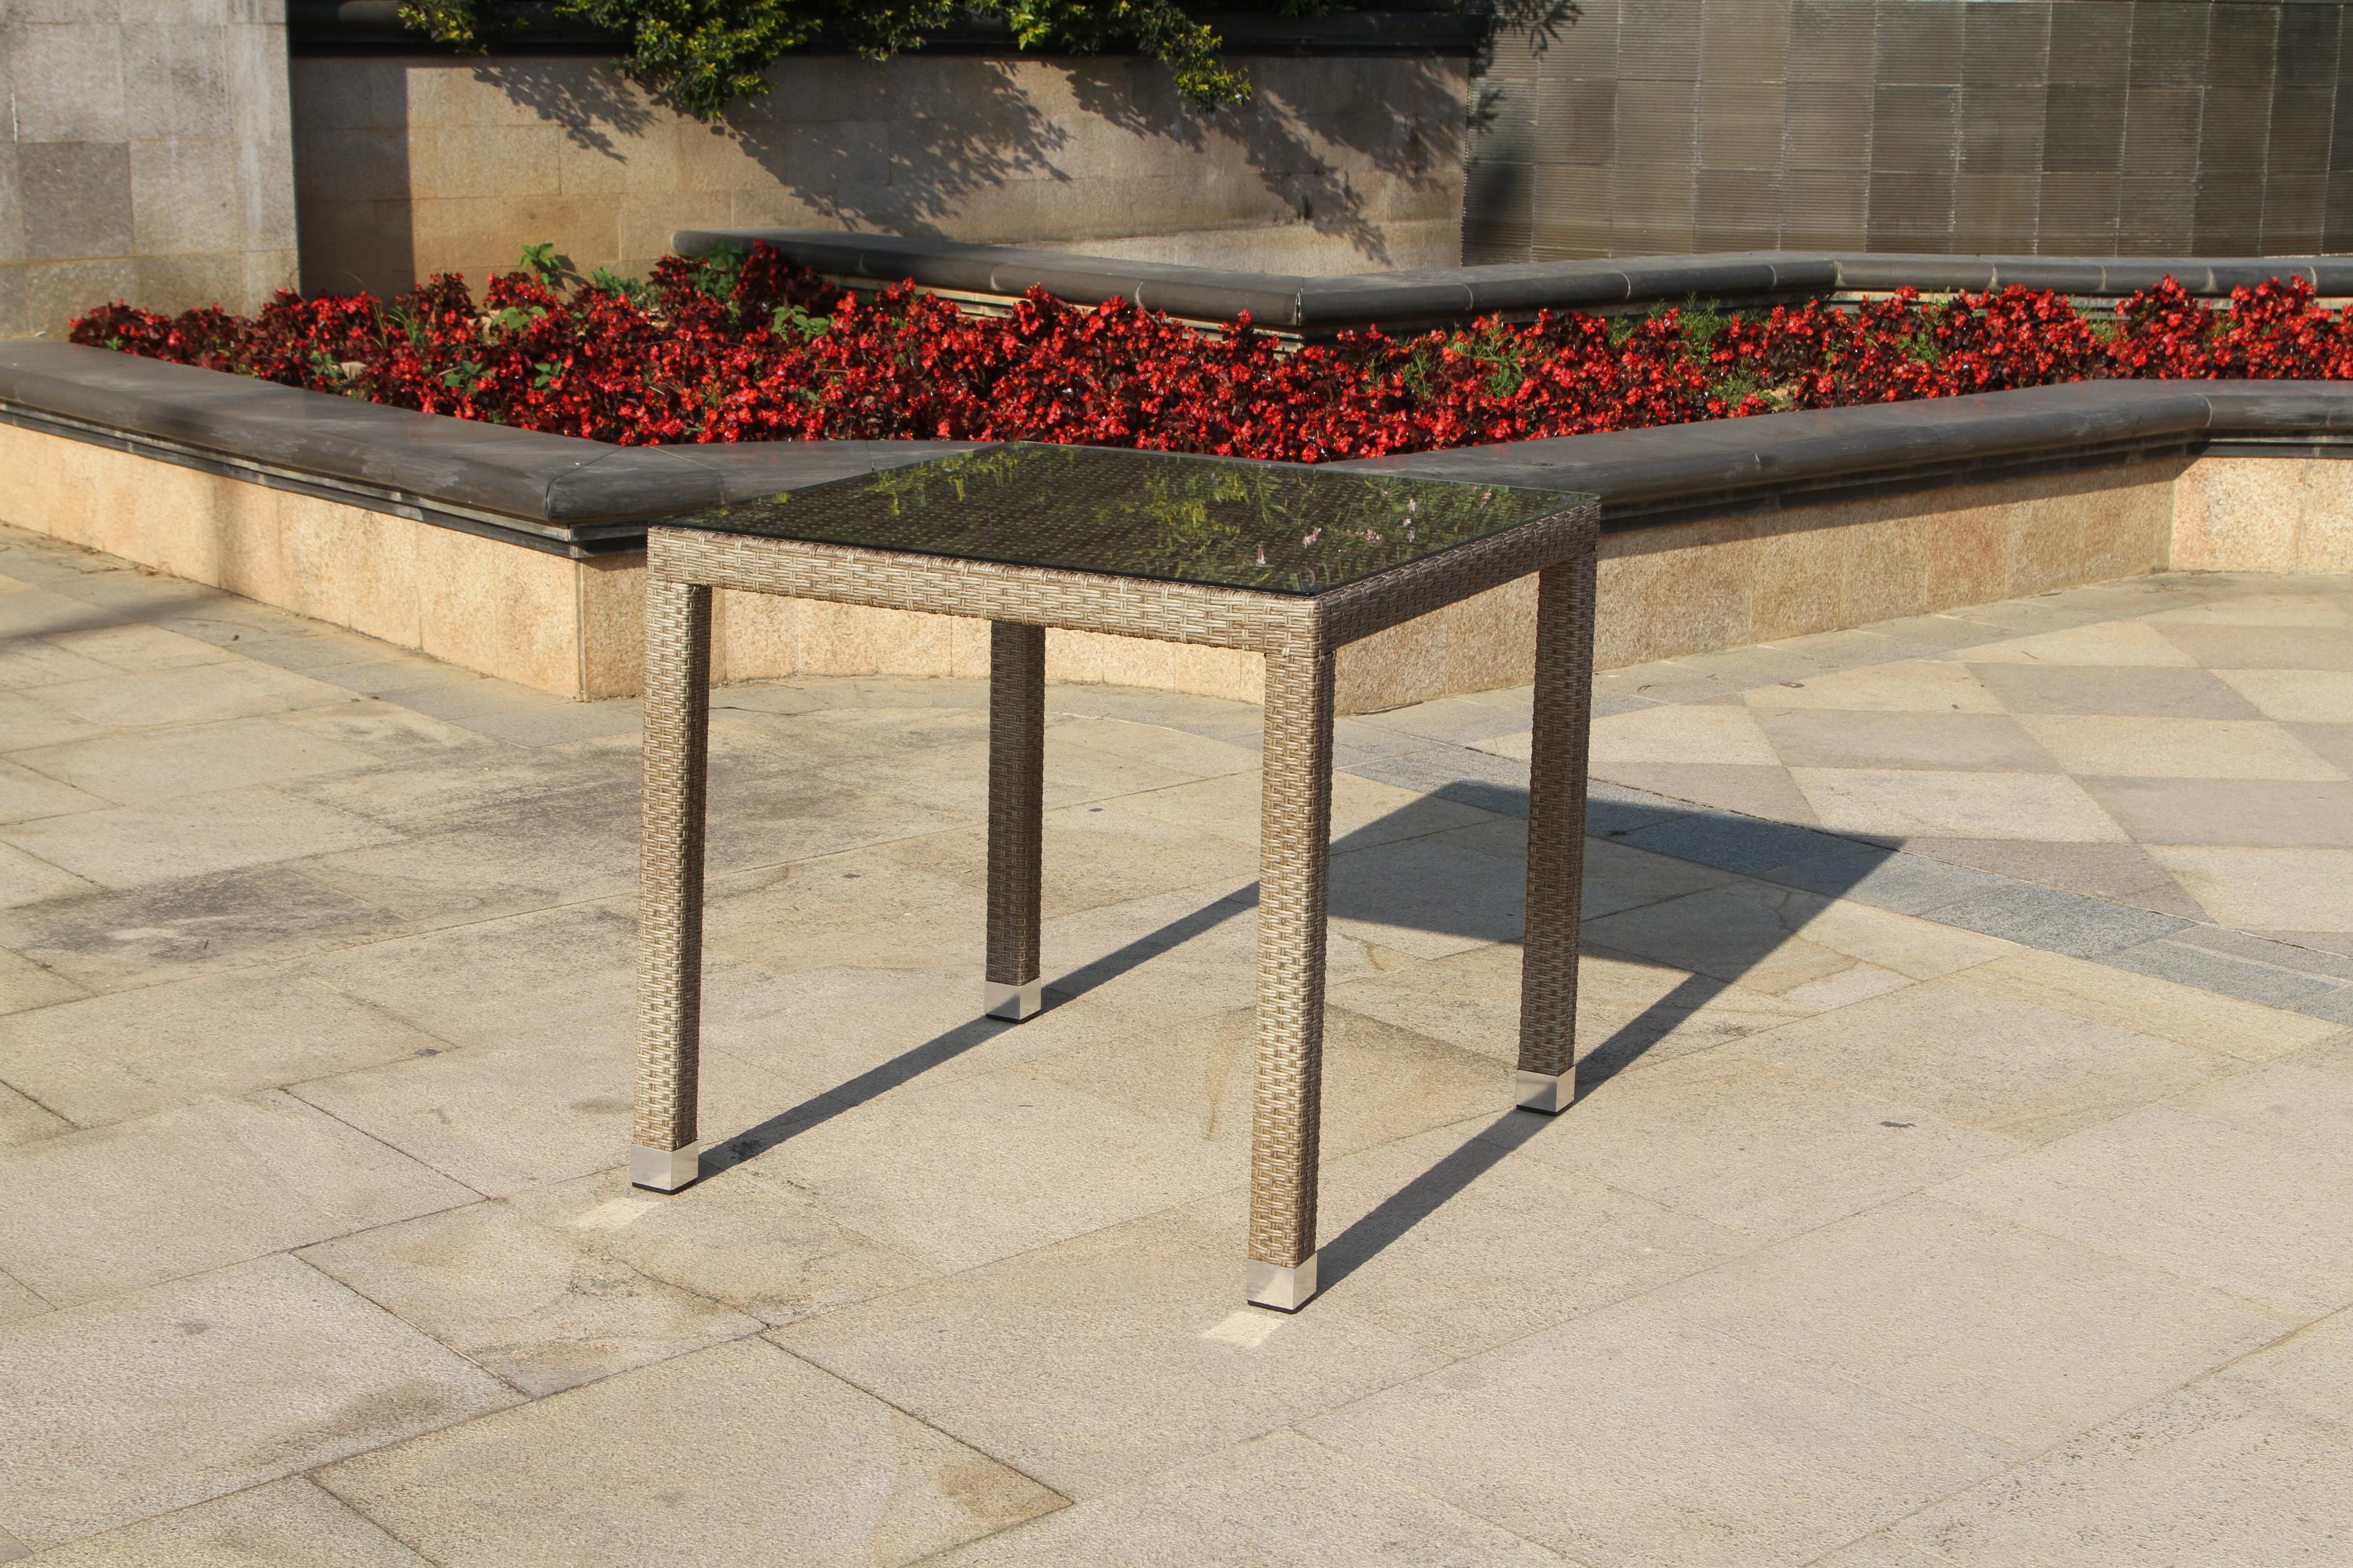 Zahradní stůl - Exterio - Cuba 80 natur (hliník + umělý ratan)